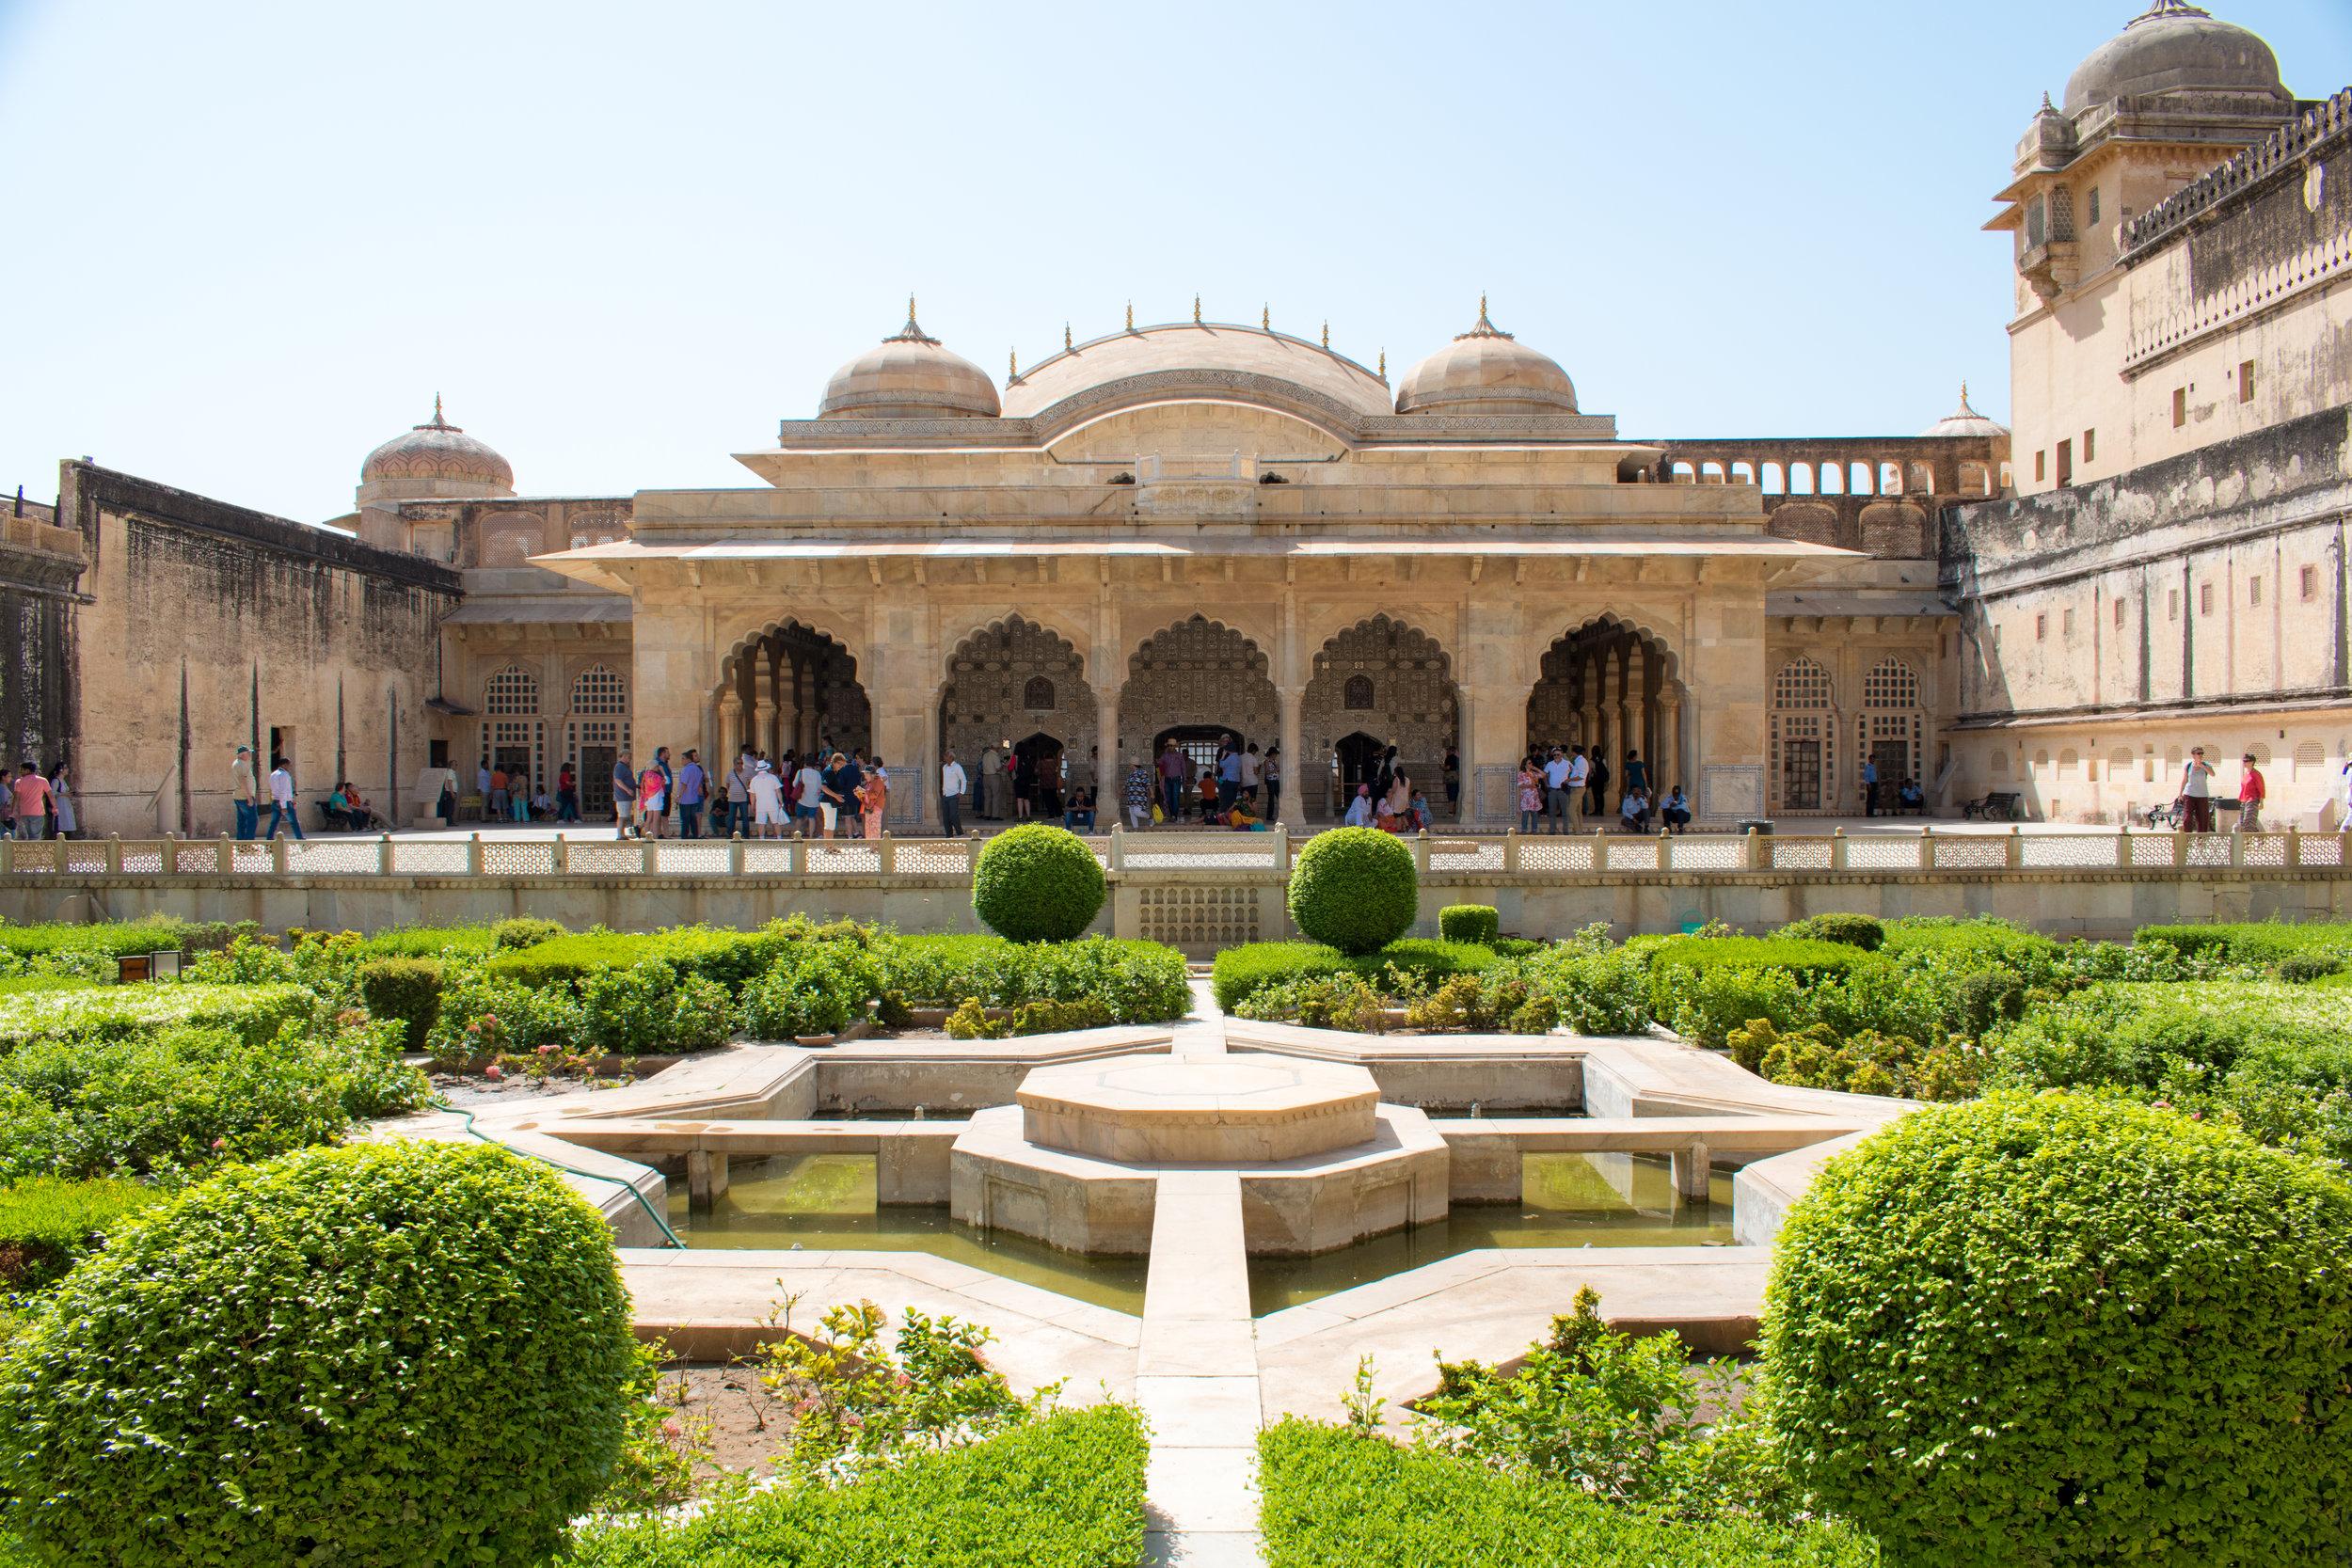 Interior Garden at Amber Fort in Jaipur, India